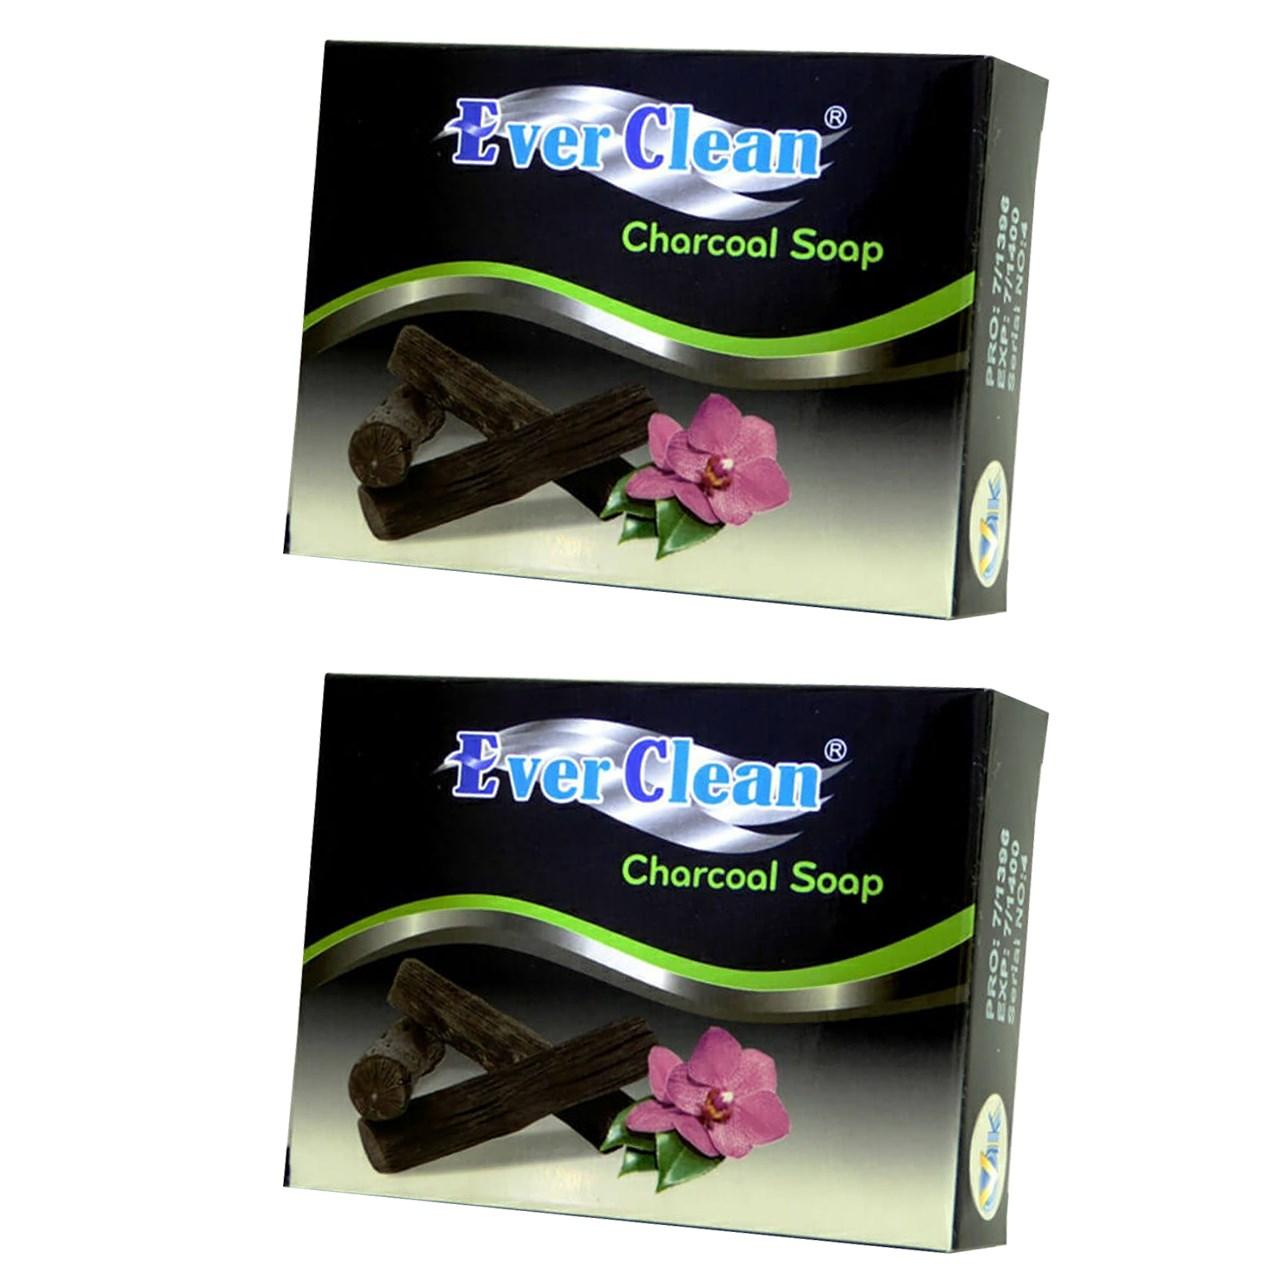 خرید                      صابون زغالی اورکلین مدل  Charcoal مجموعه 2 عددی حجم 70 گرم